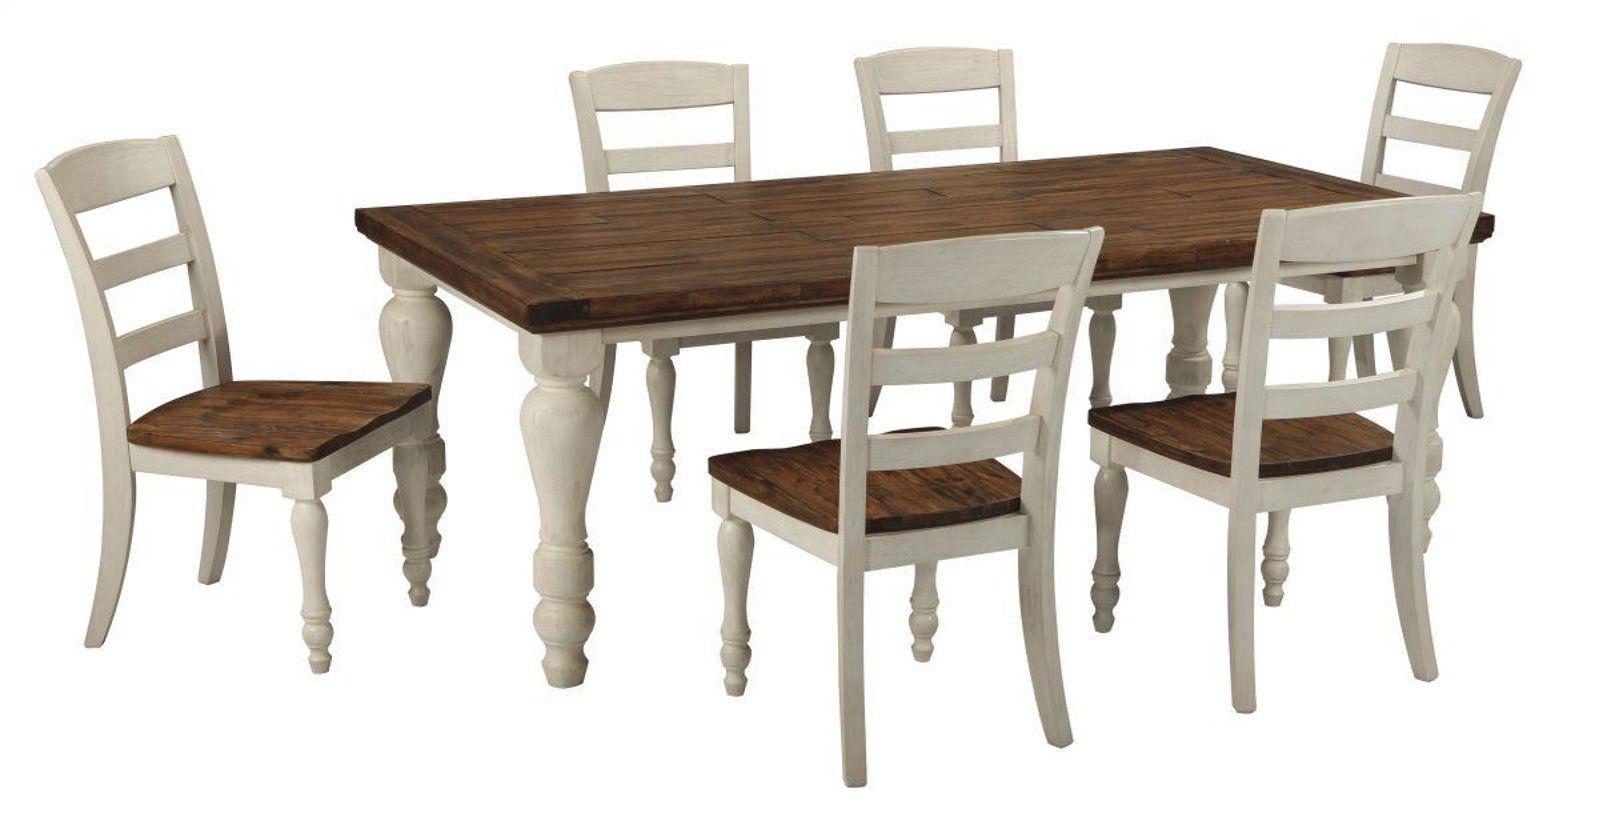 marsilona dining room tableTags :#diningtable #diningtables #diningtabledecor #diningtablebench #diningtablecenterpiece #diningtableinspo #diningtableset #diningtablewithglassandclass #diningtablewoodFor more,Visit Here